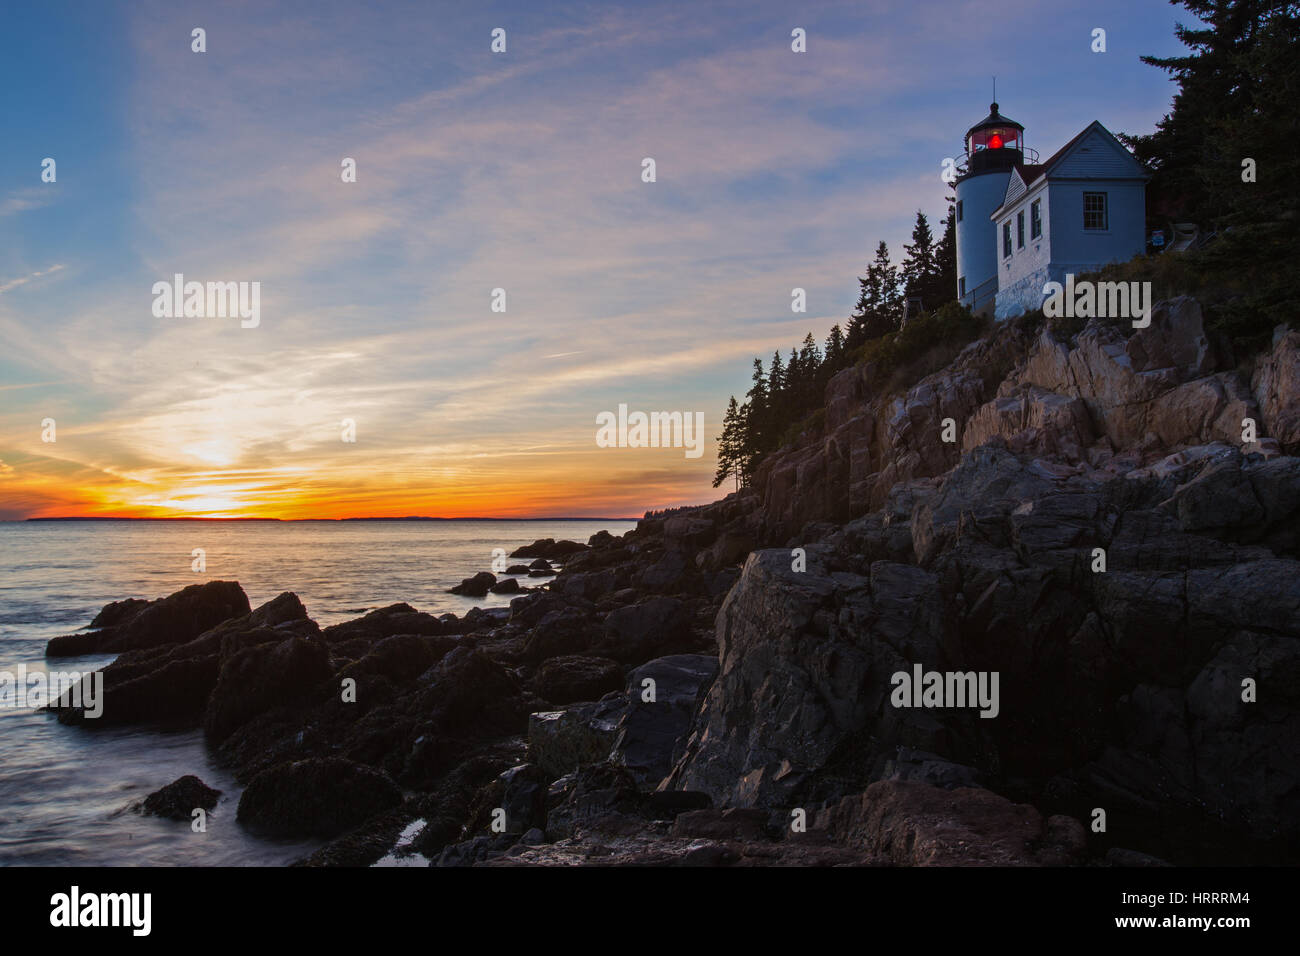 New England Lighthouse, The Bass Harbor Head Light - Stock Image